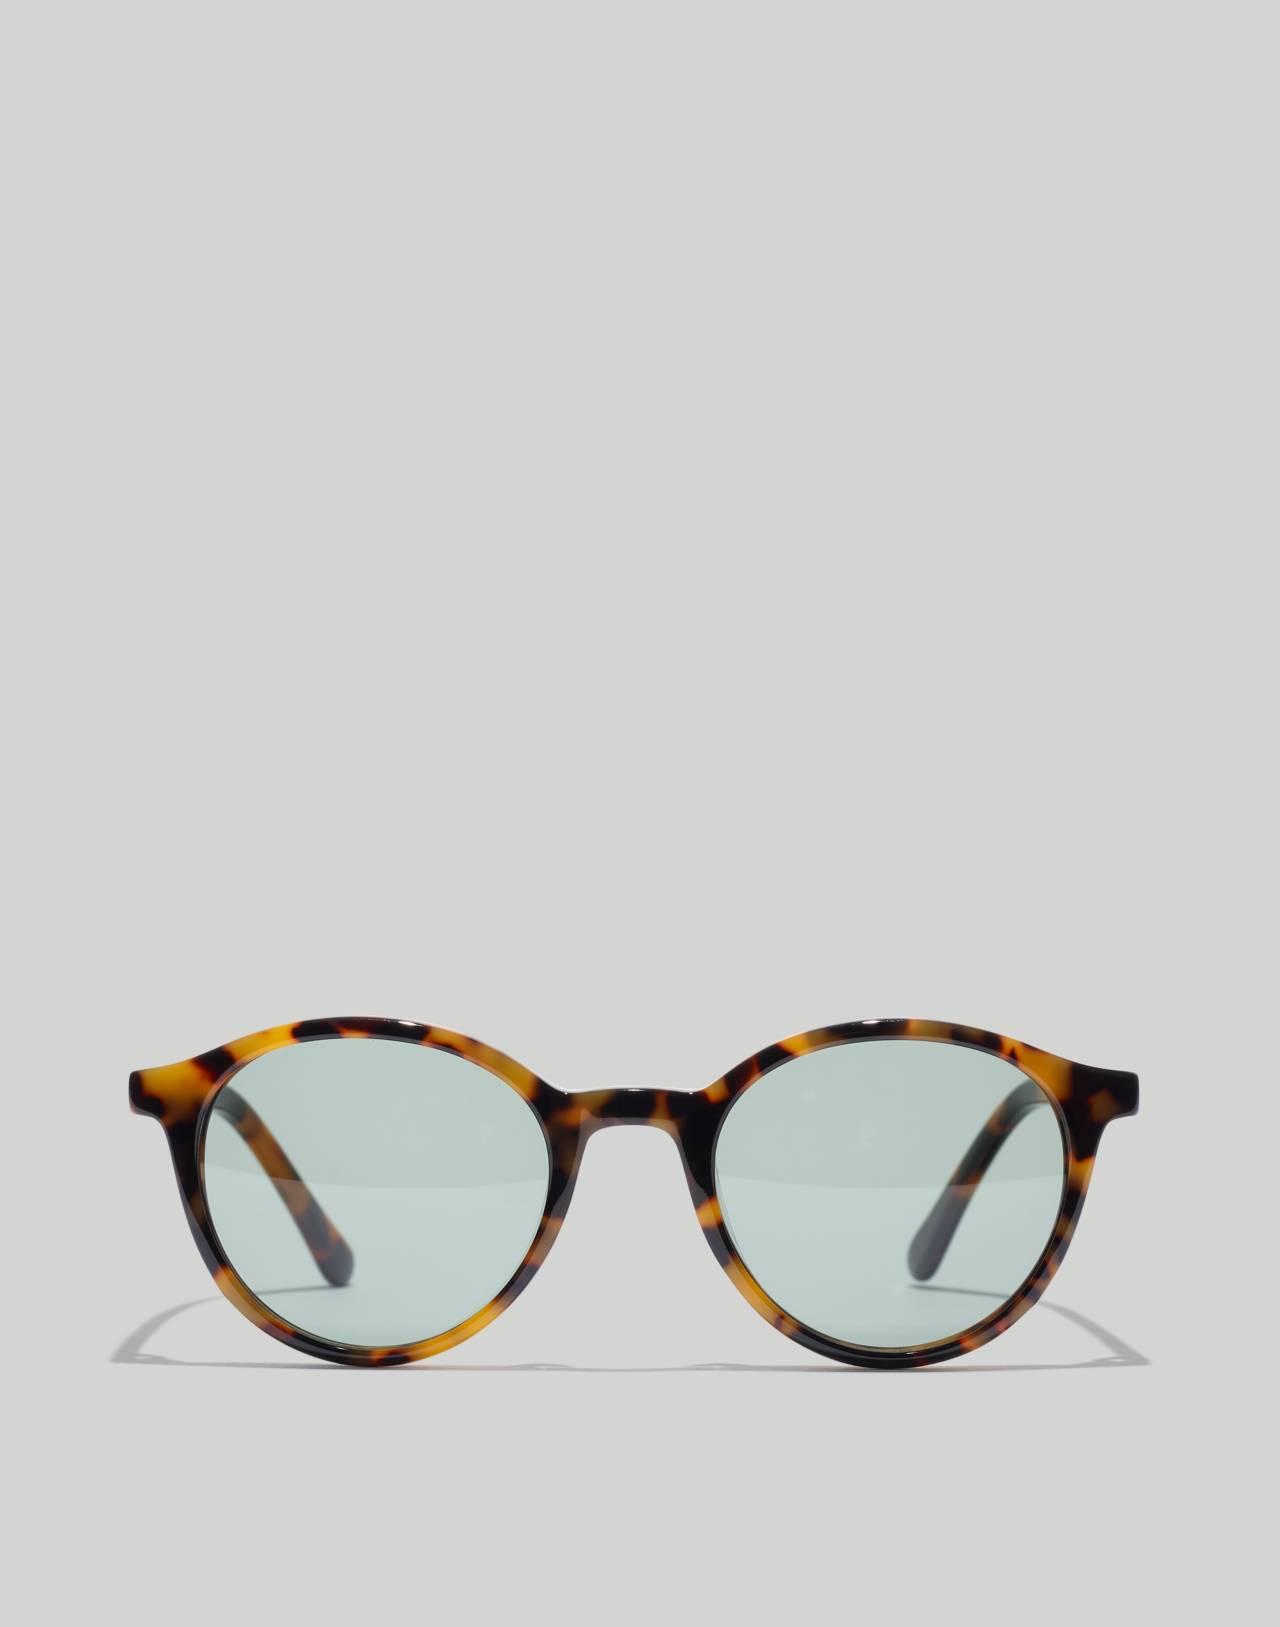 Layton Sunglasses in demi tort image 1